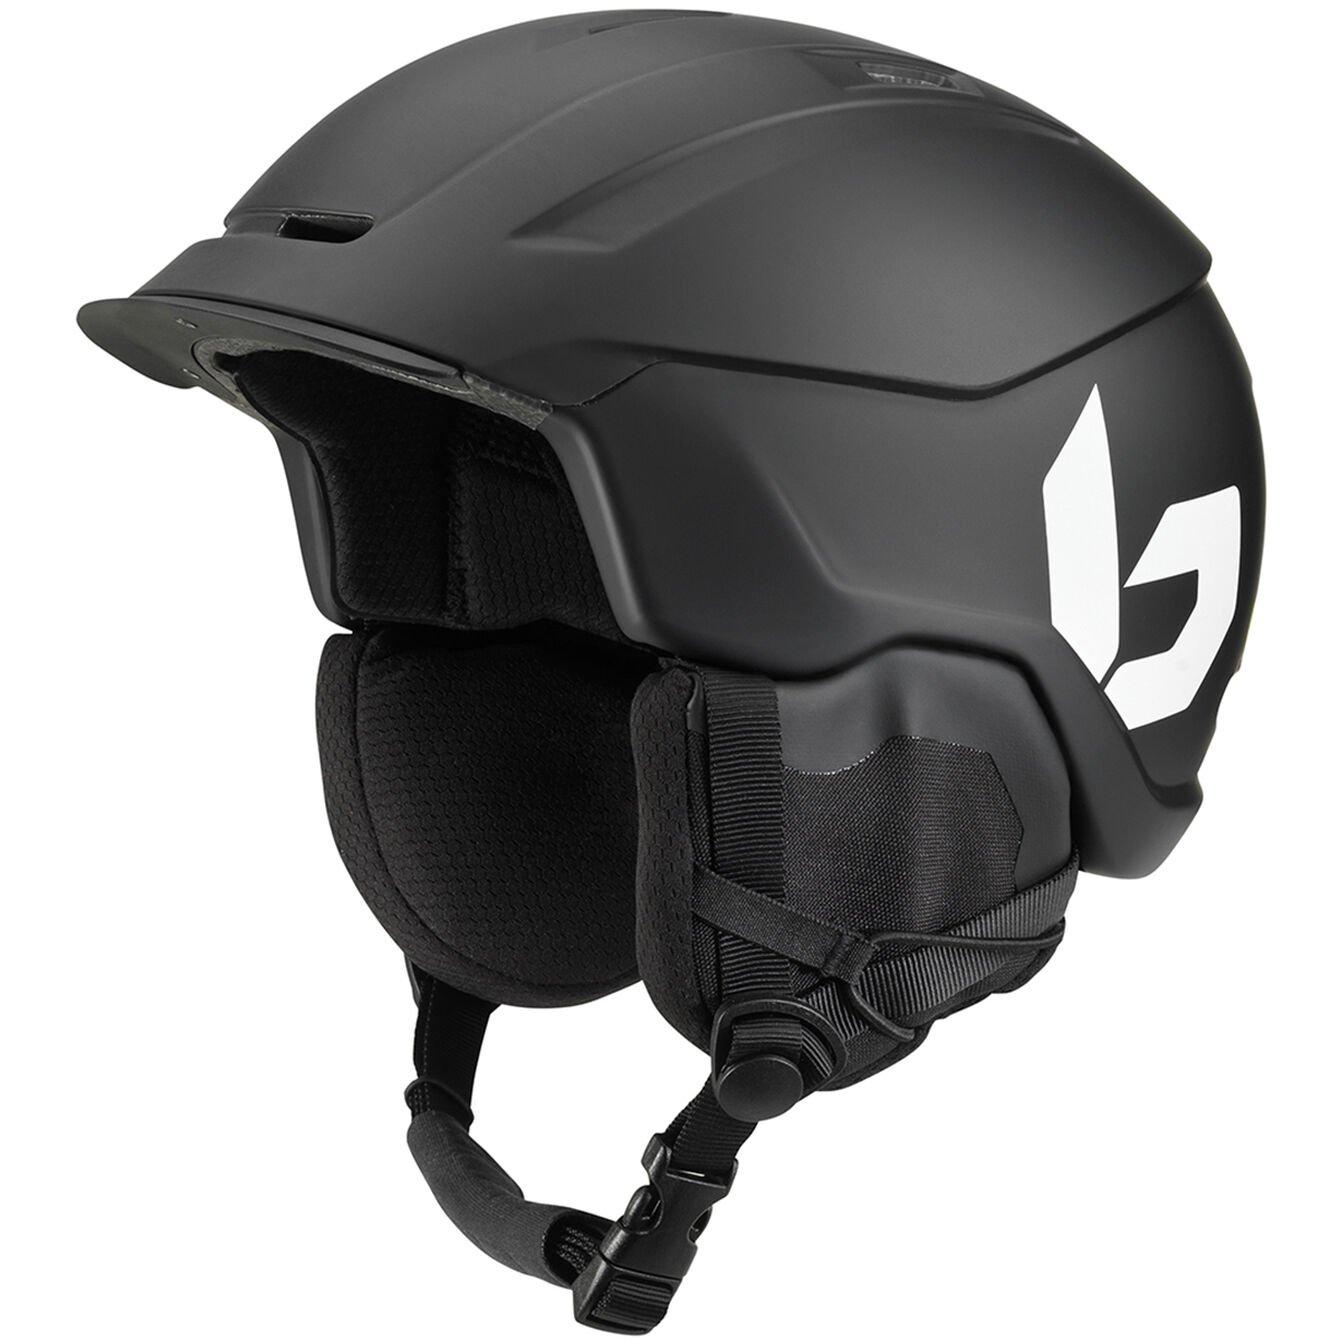 Bolle Instinct 2.0 Mips Helmet 2021